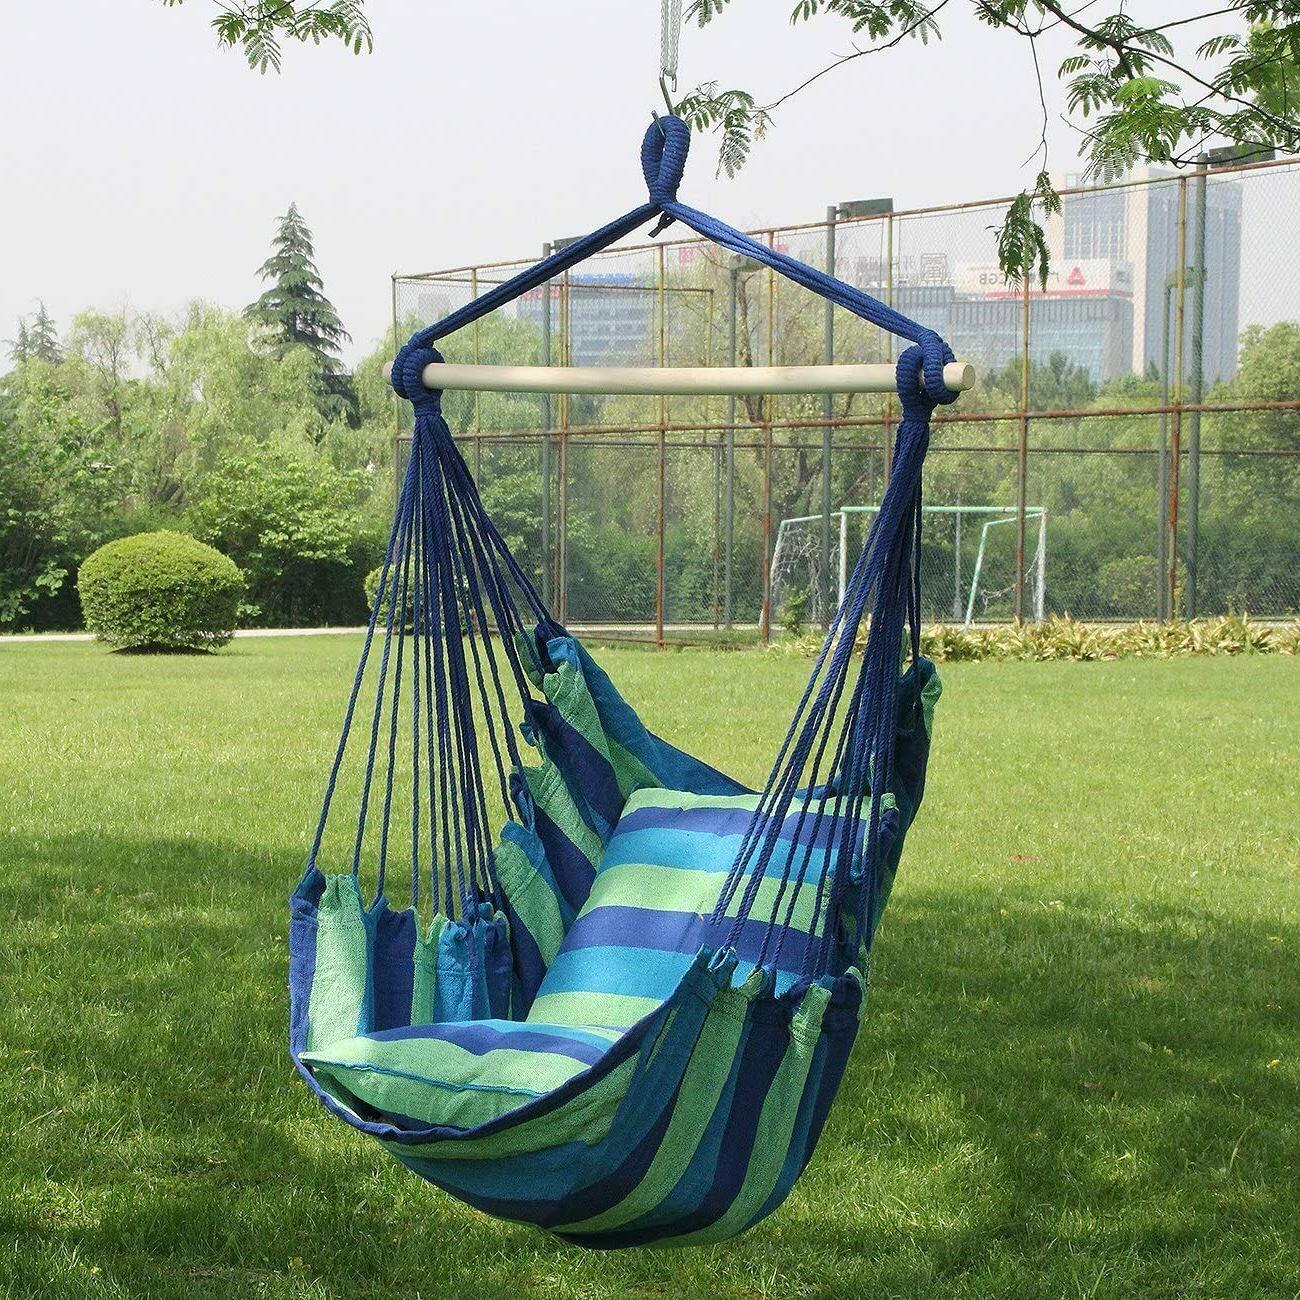 Sorbus Hanging Chair Swing Seat Indoor or Lbs